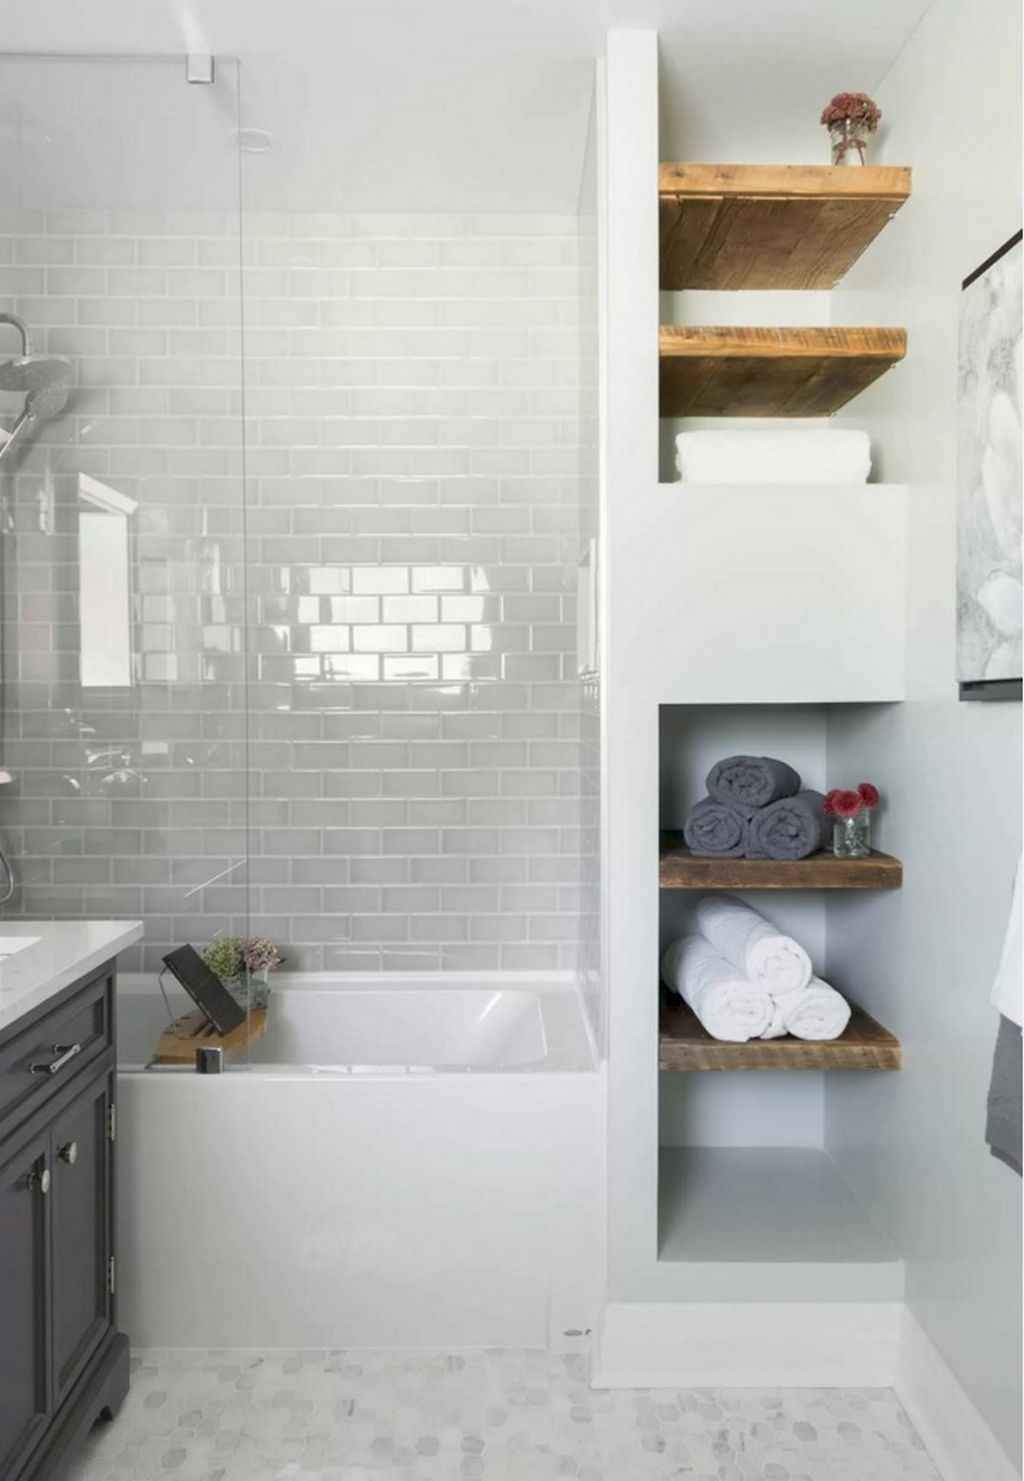 Inspiring apartment bathroom remodel ideas on a budget (32)